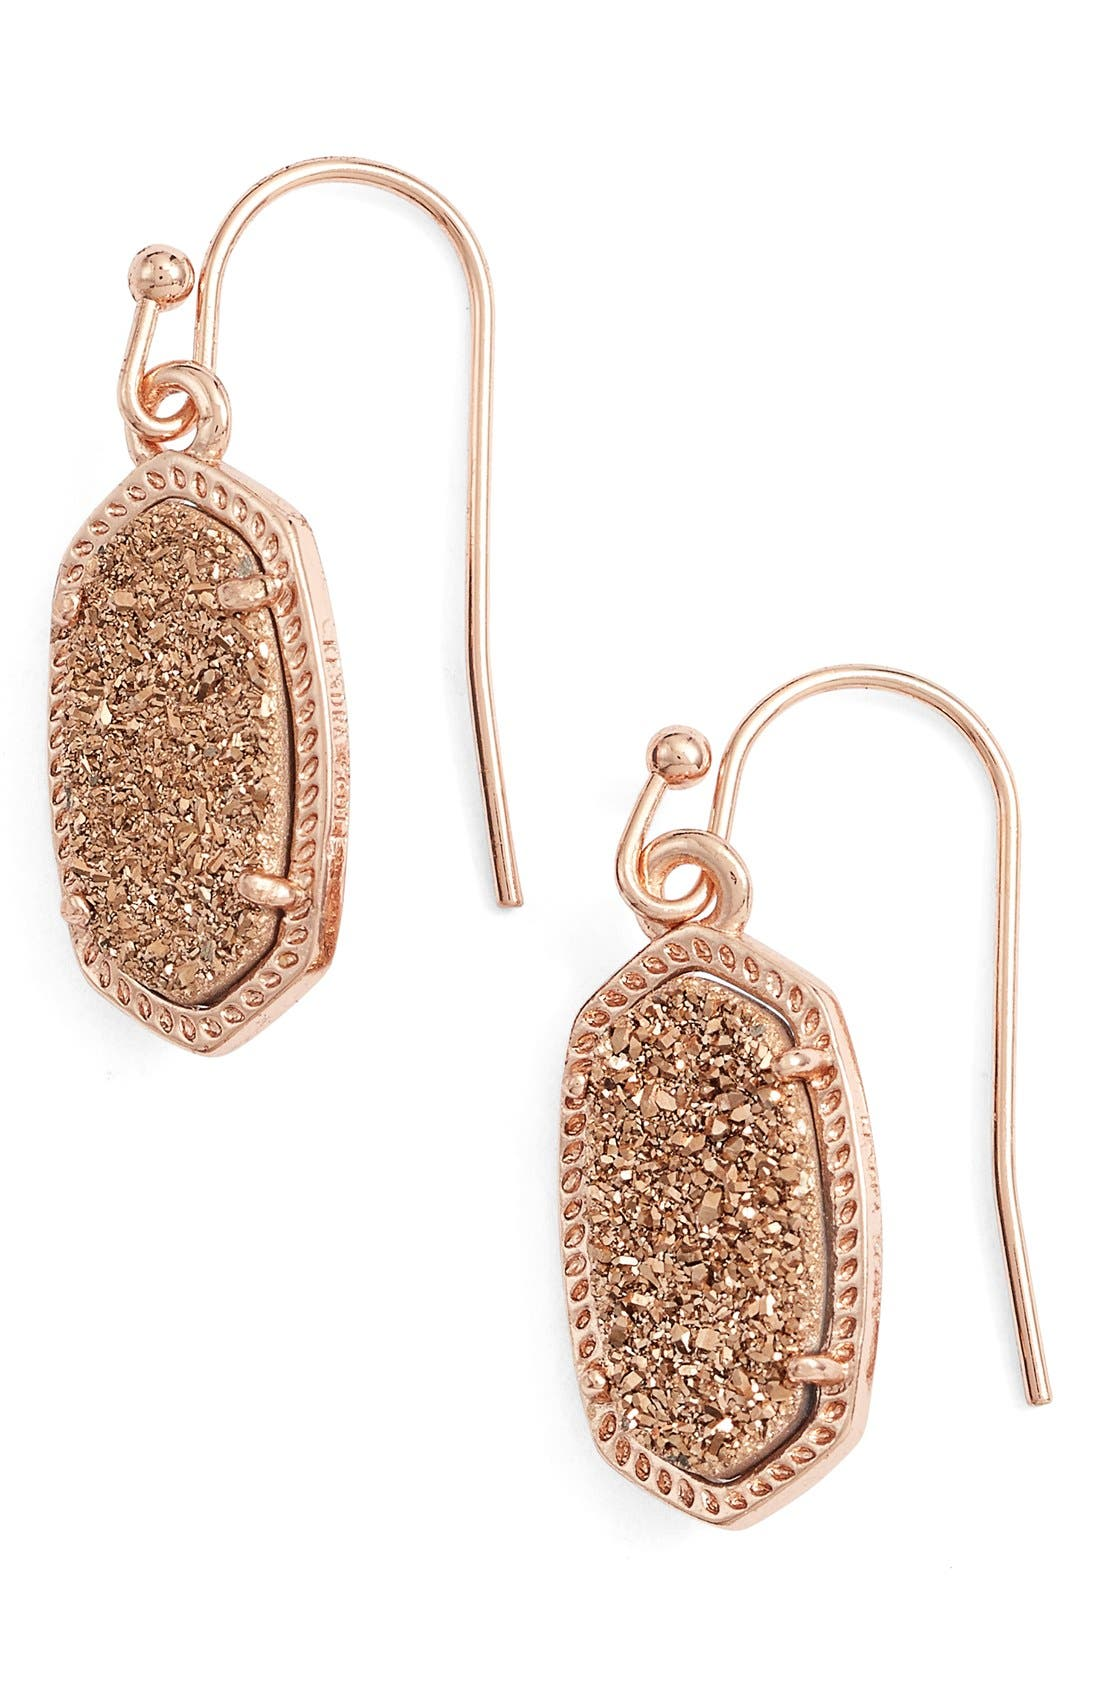 Lee Small Drop Earrings,                             Main thumbnail 1, color,                             Rose Drusy/ Rose Gold